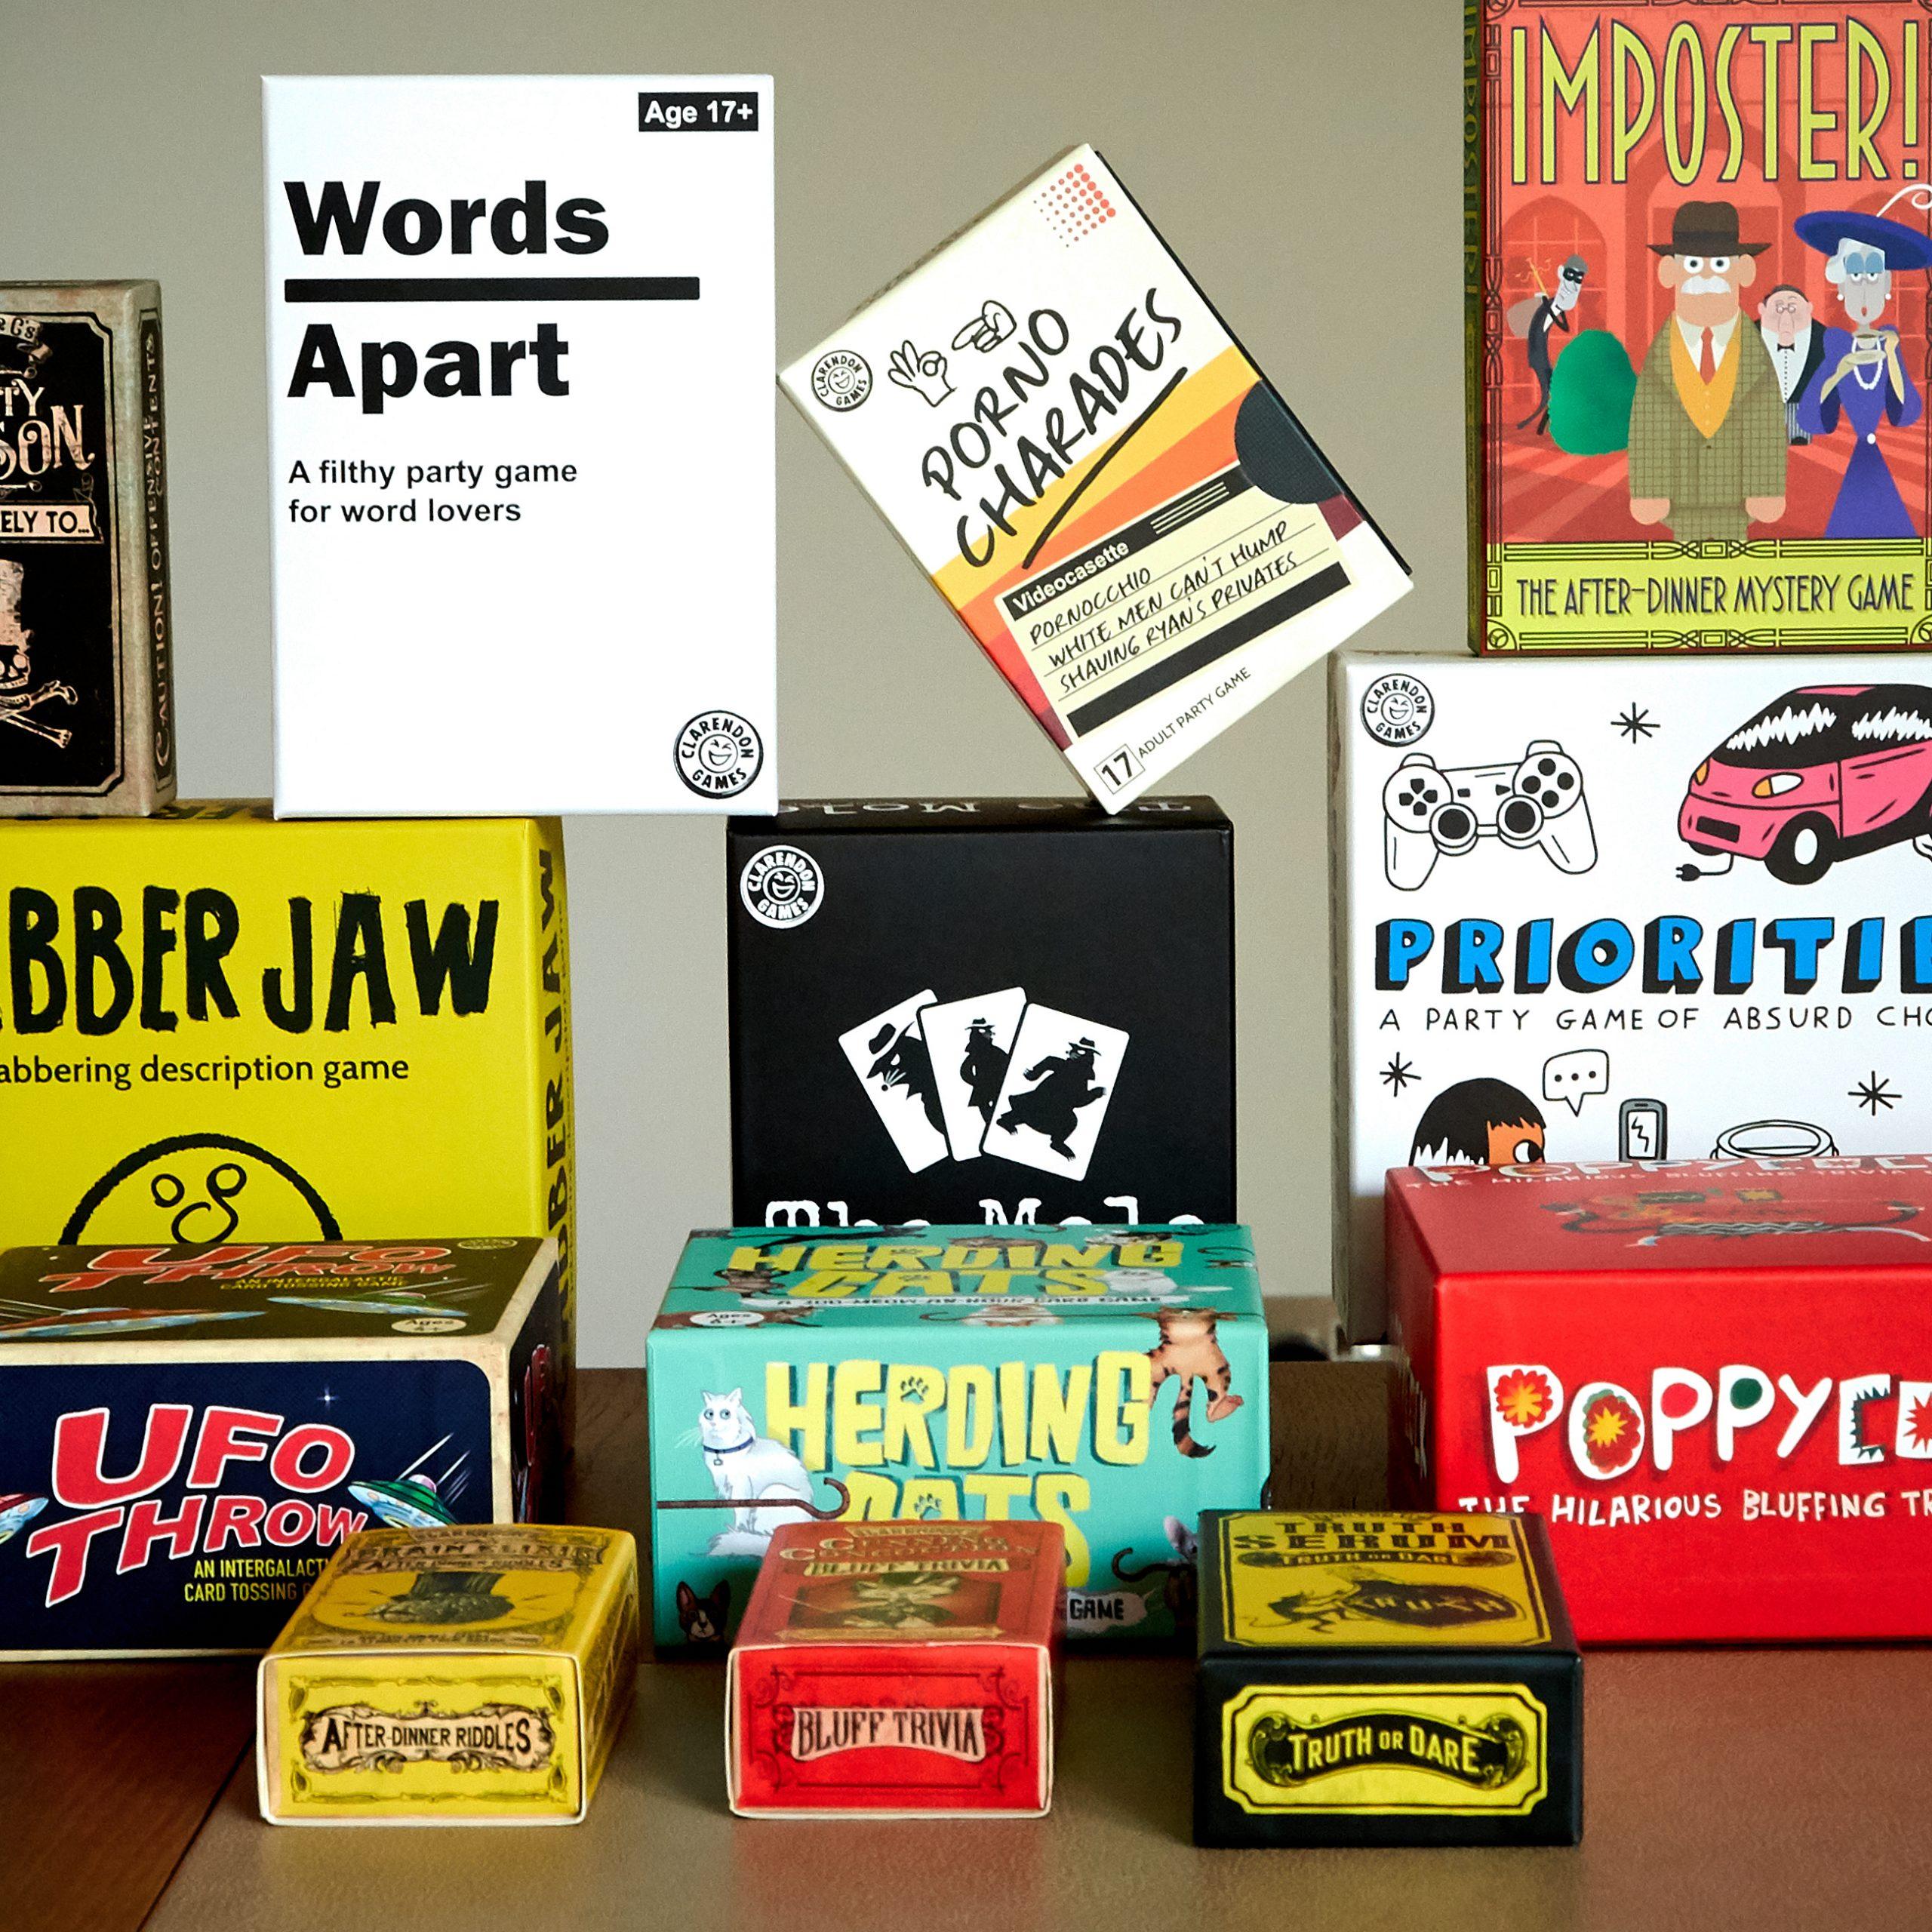 Clarendon Games collection